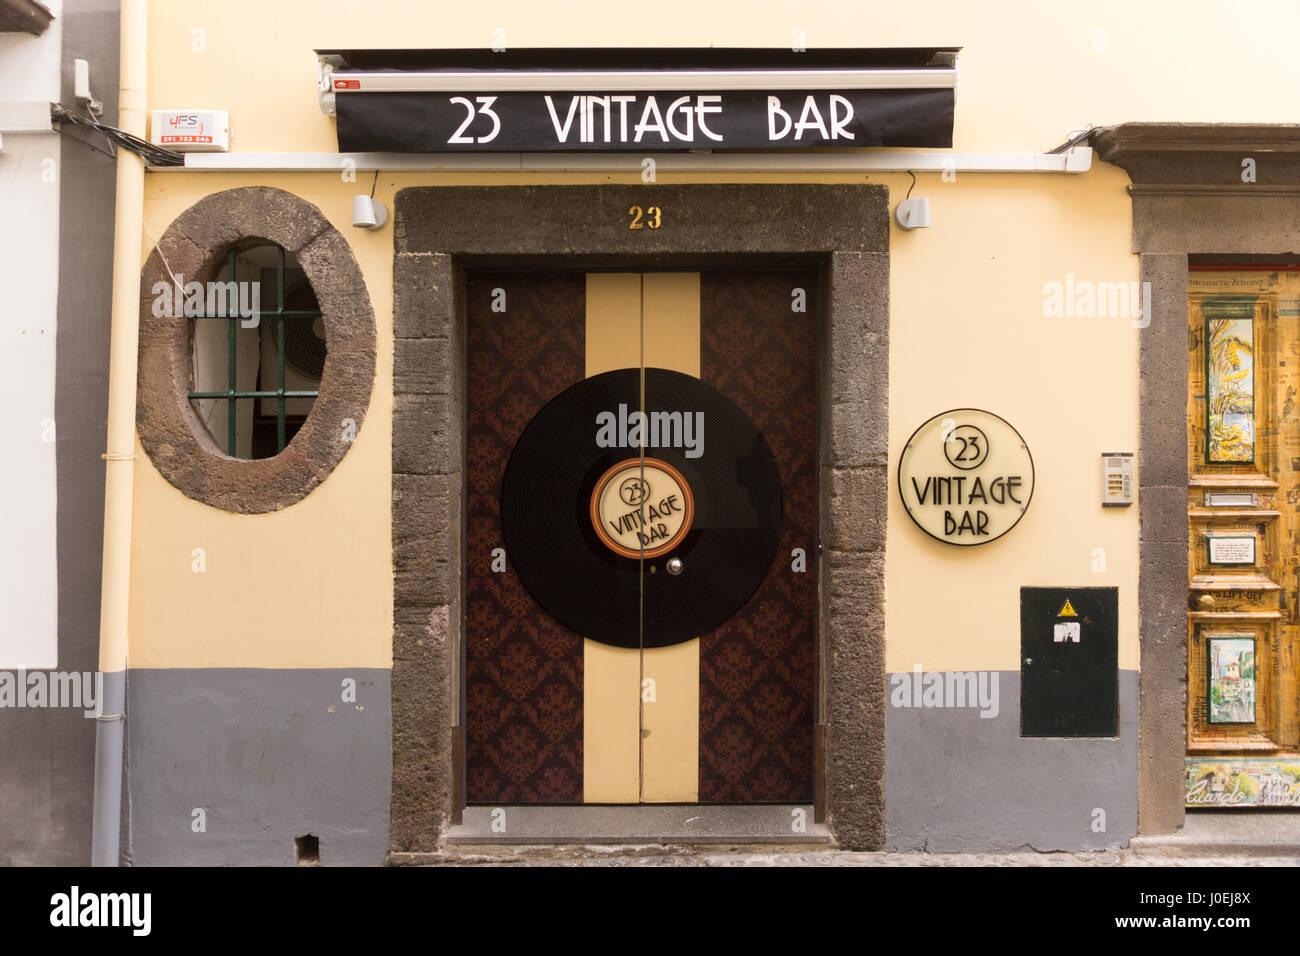 23-vintage-bar-funchal-J0EJ8X.jpg